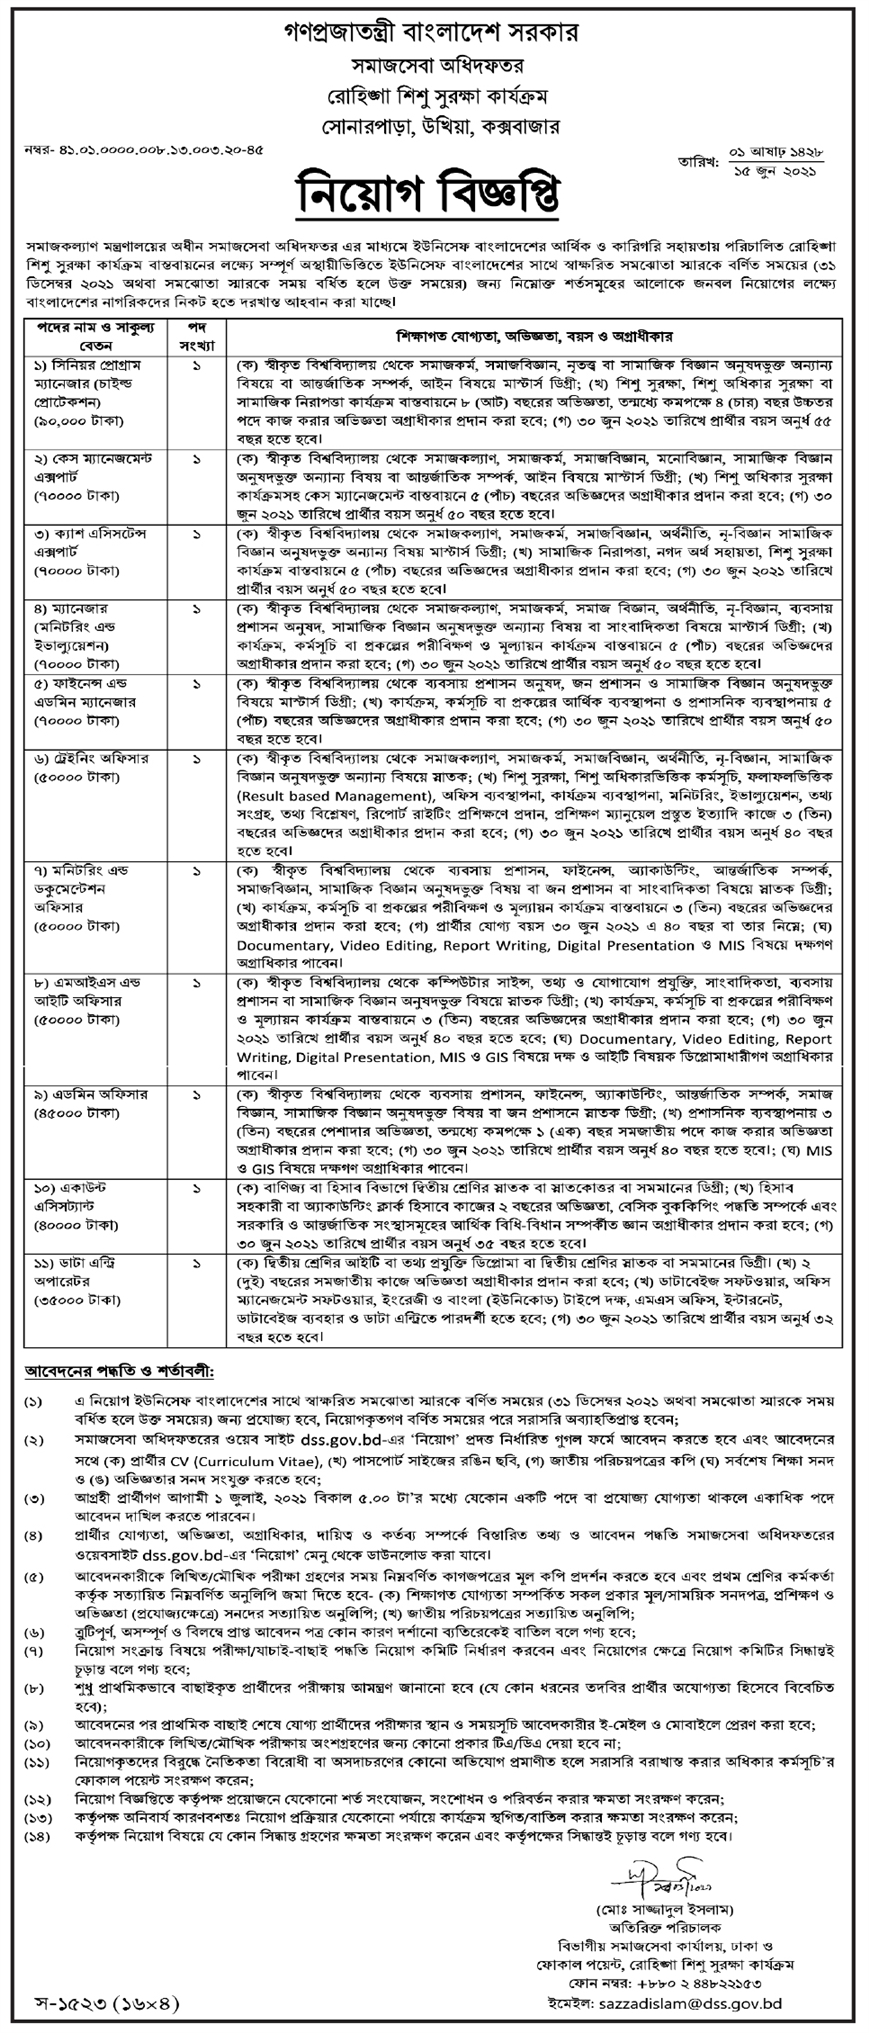 DSS Job Circular 2021